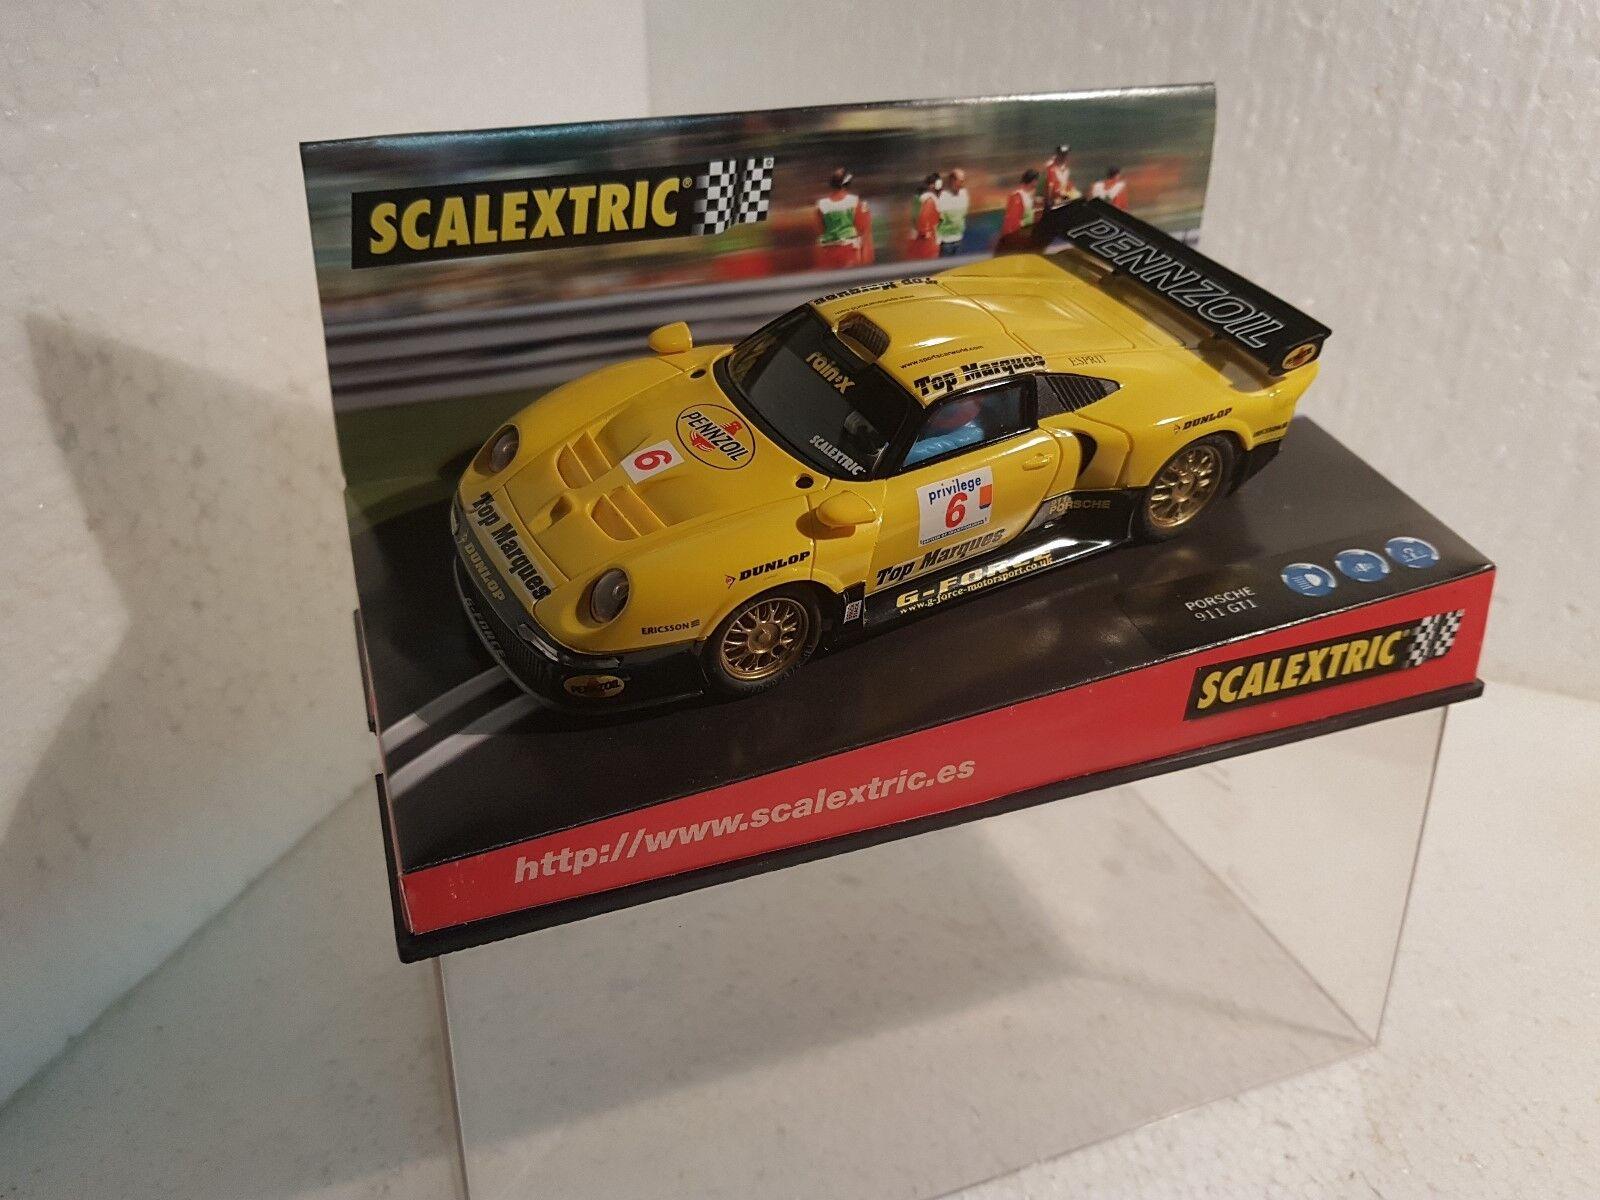 Qq 6015 SCALEXTRIC PORSCHE 911 GT1 PENNZOIL  6